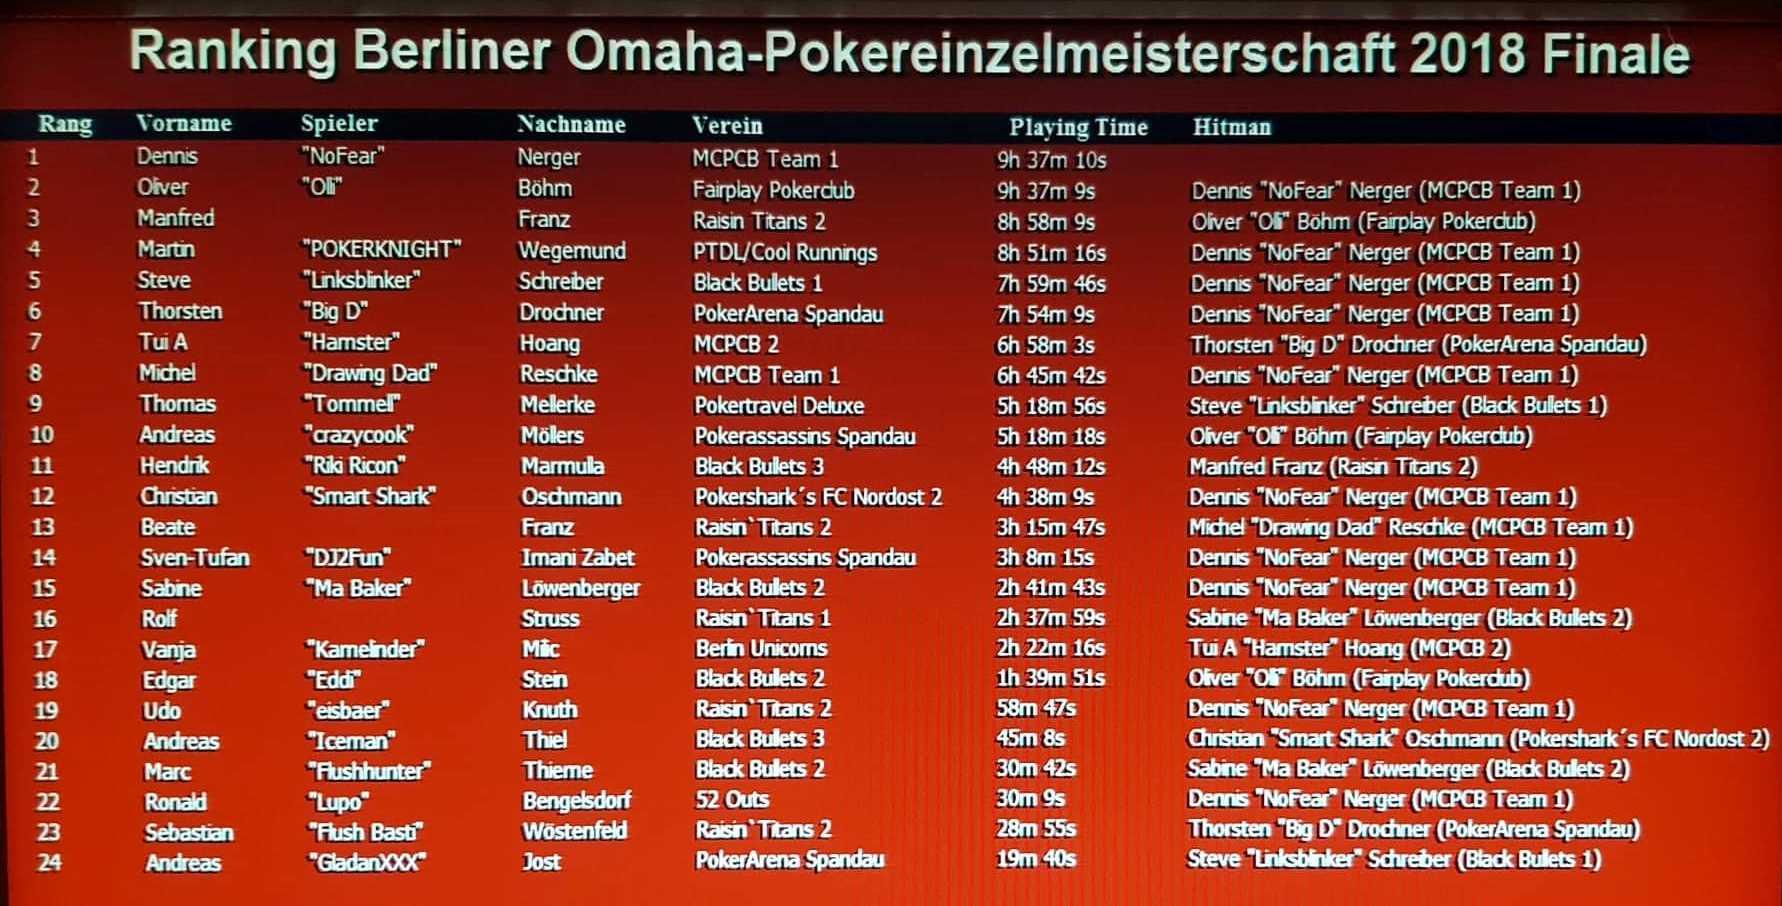 PVB-Omaha-Pokereinzelmeisterschaft 2018 : Das Ranking